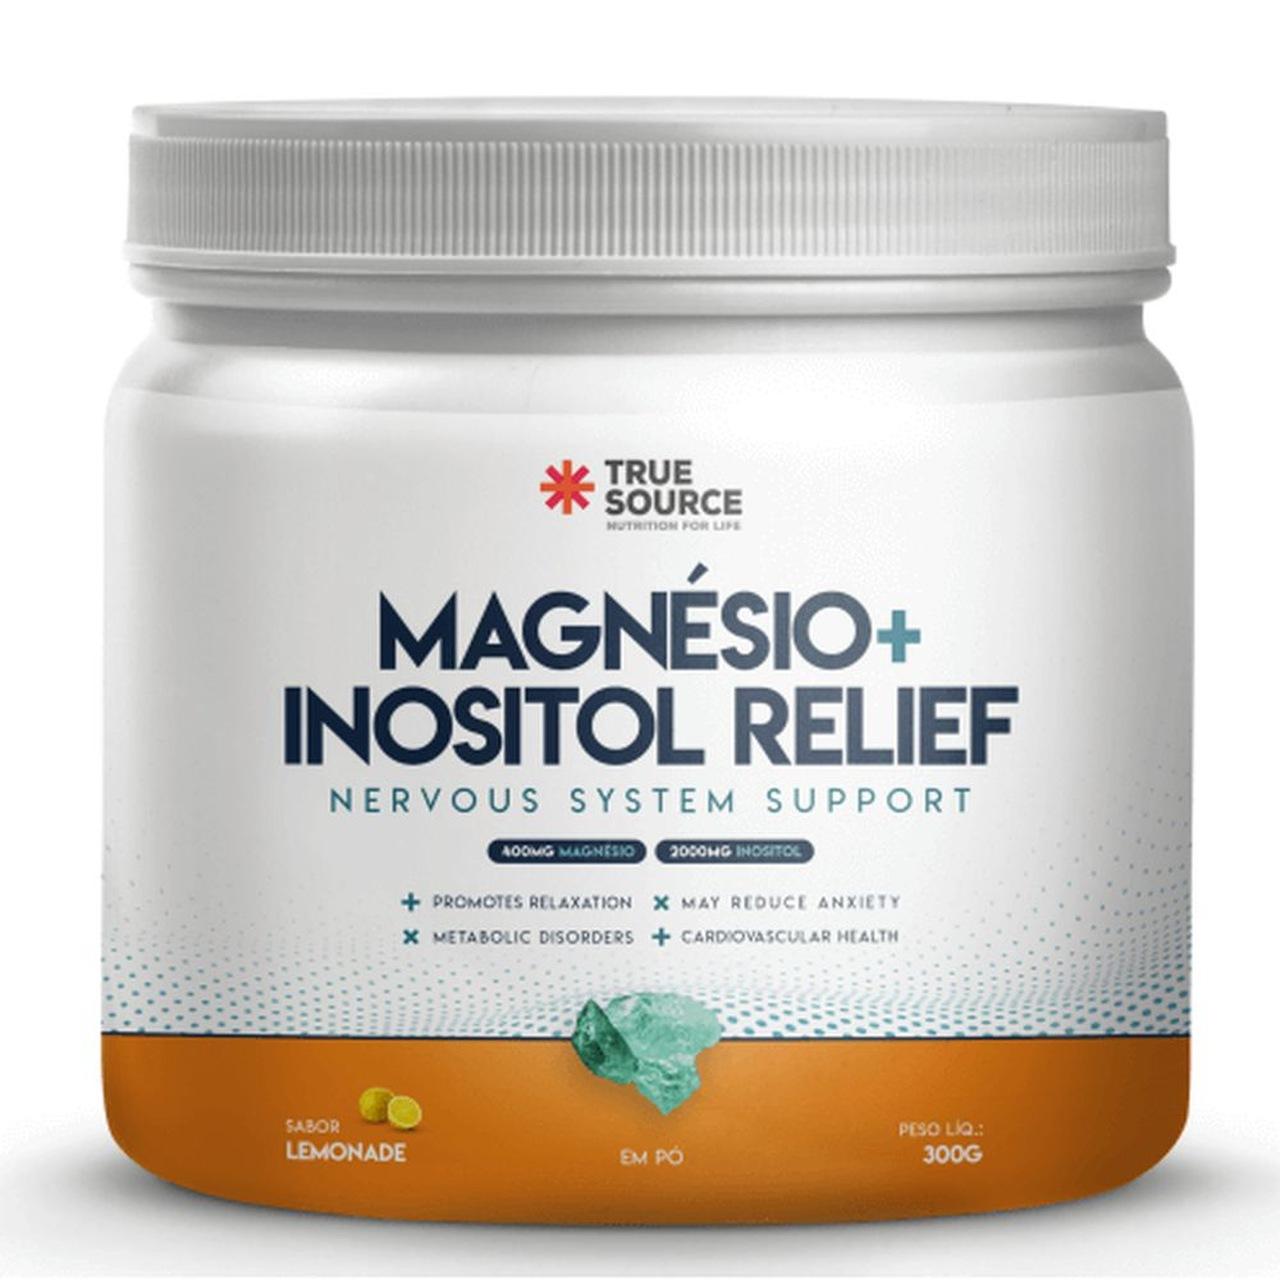 Magnésio + Inositol Relief (300g) - True Source